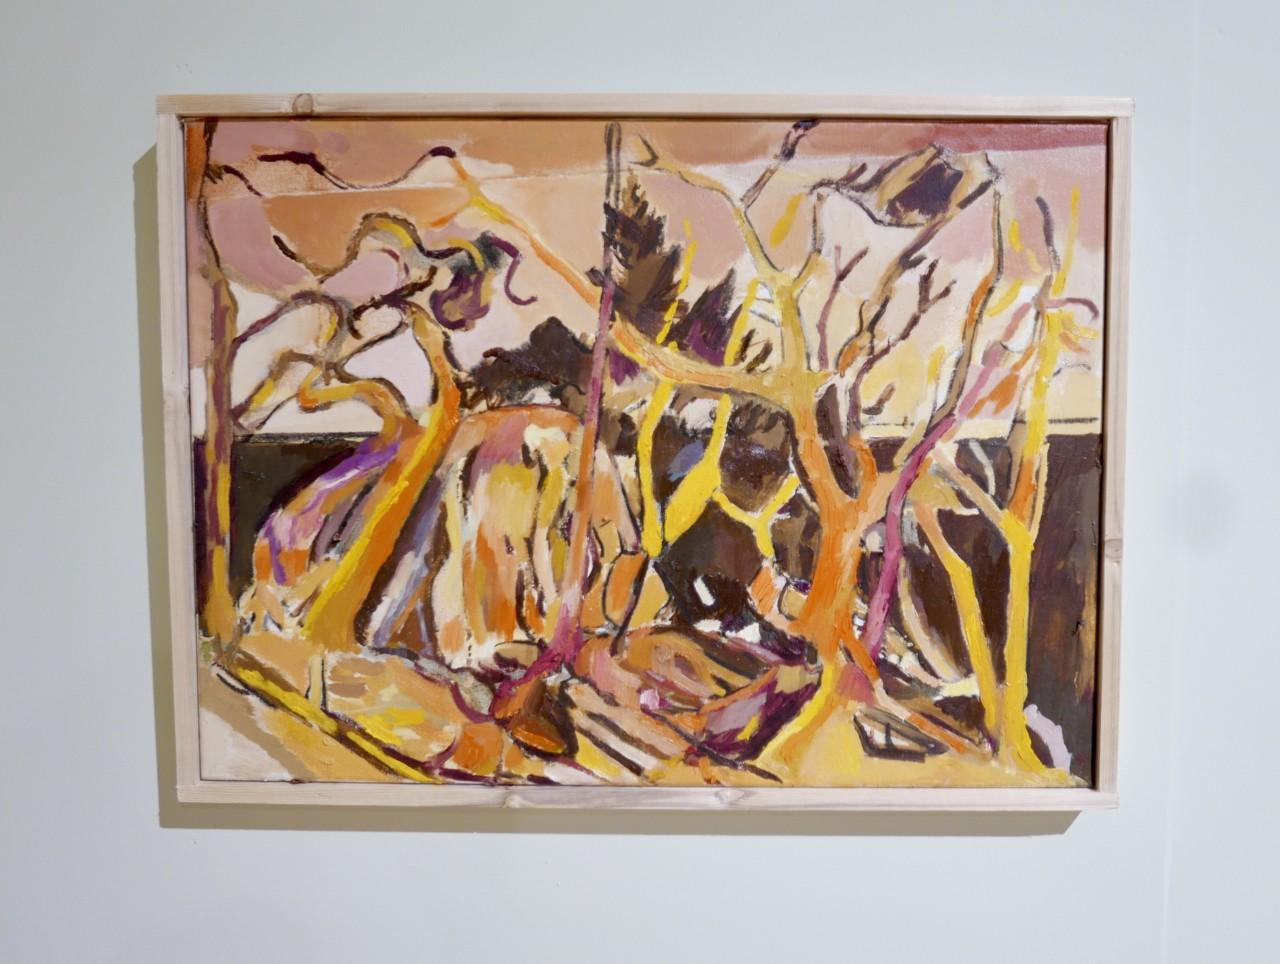 andreas-siqueland-kunstner-malerier-natur-oslo-design-fair